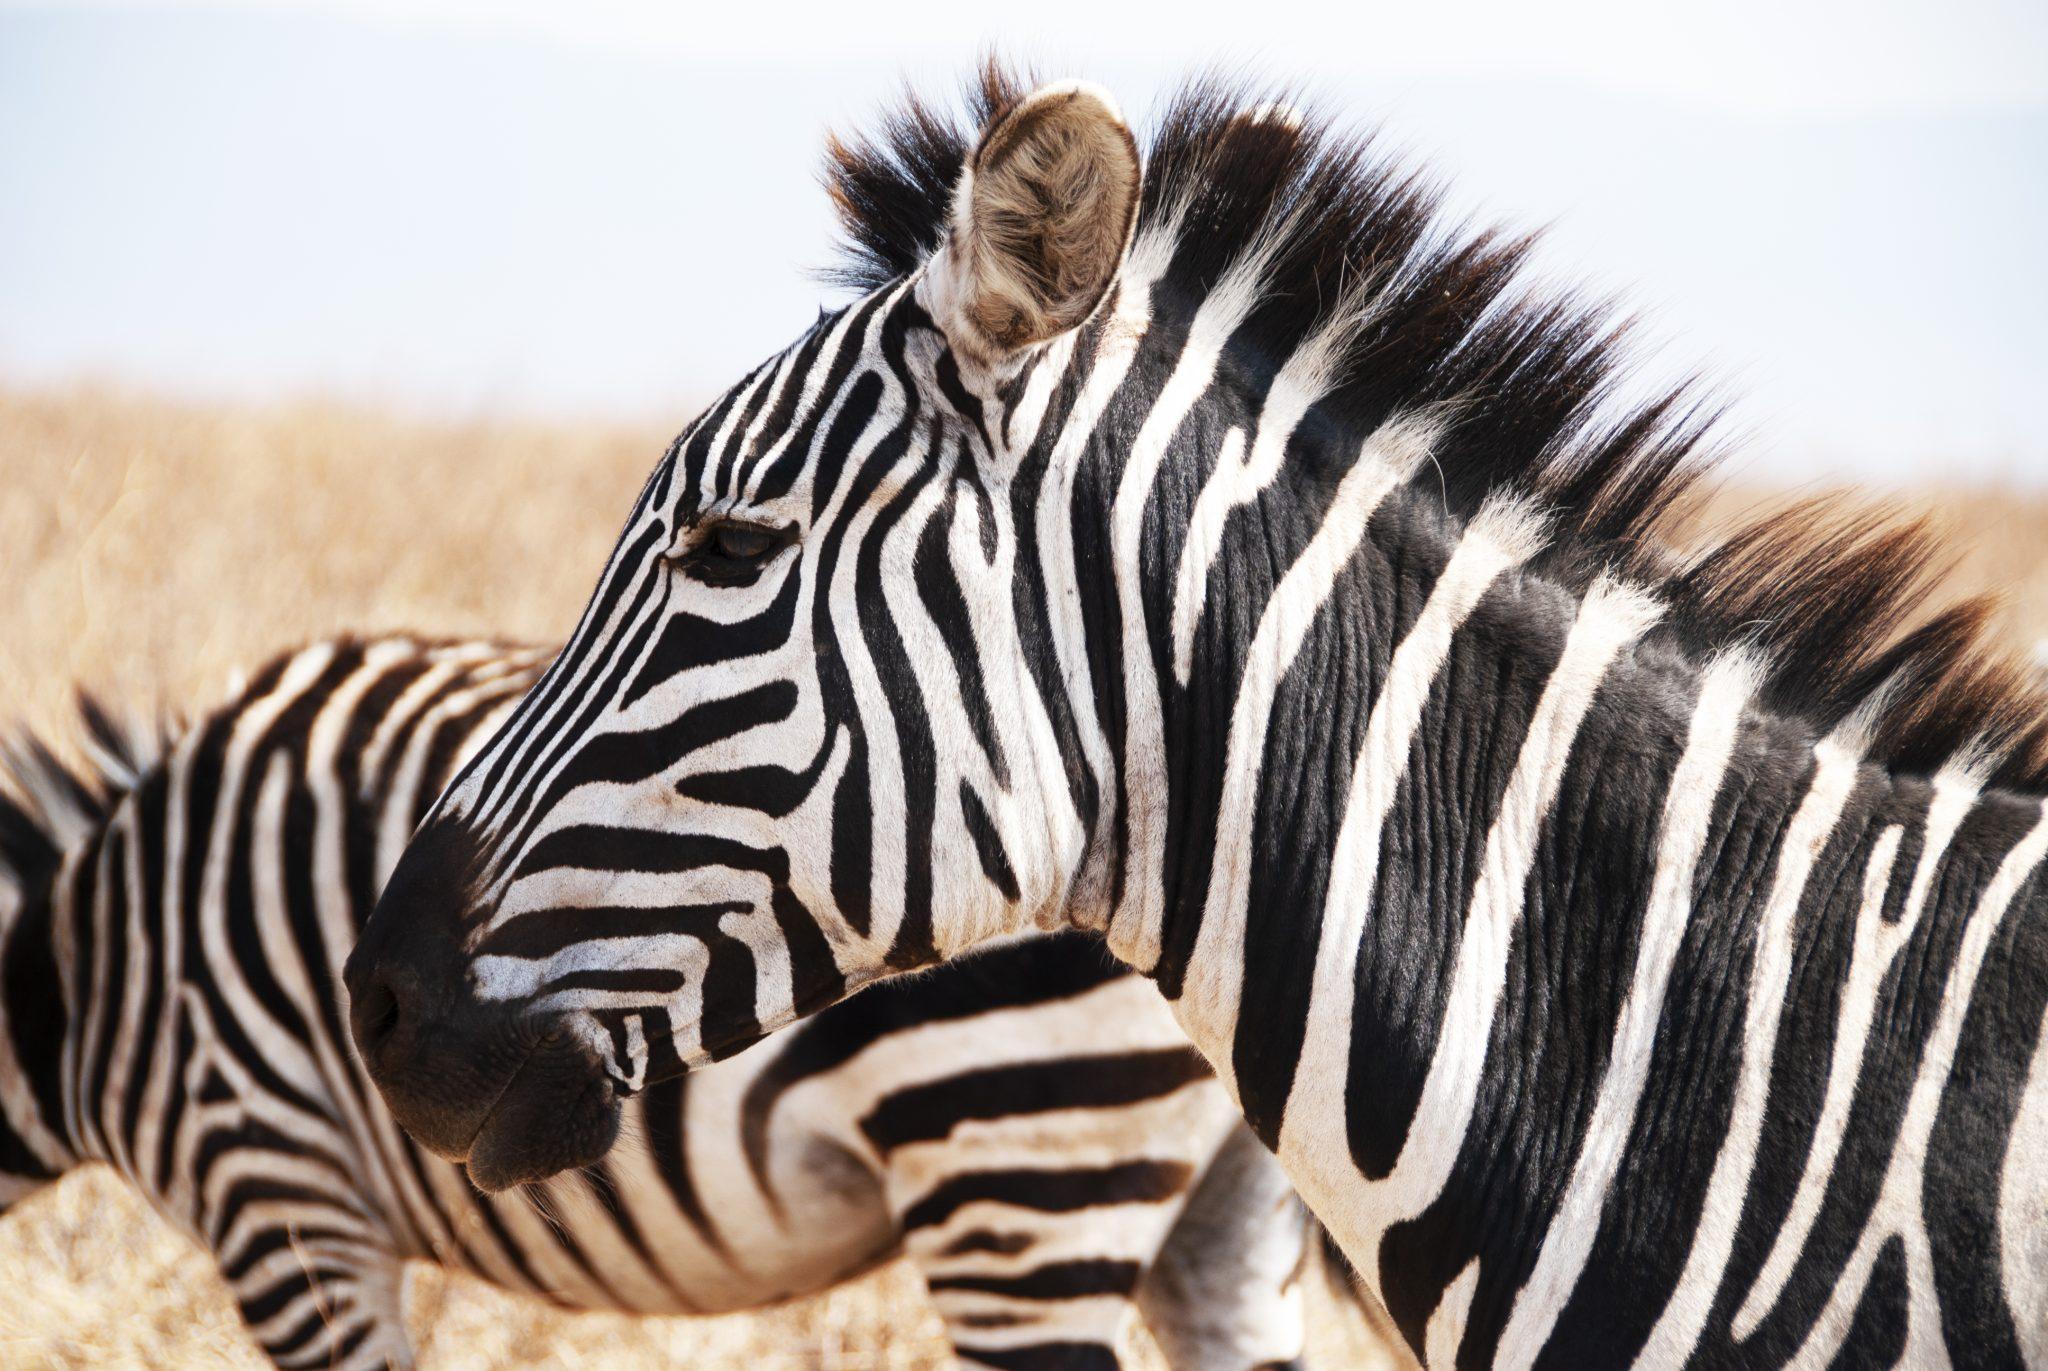 https://www.safariventures.com/wp-content/uploads/2019/01/DSC3591.jpg